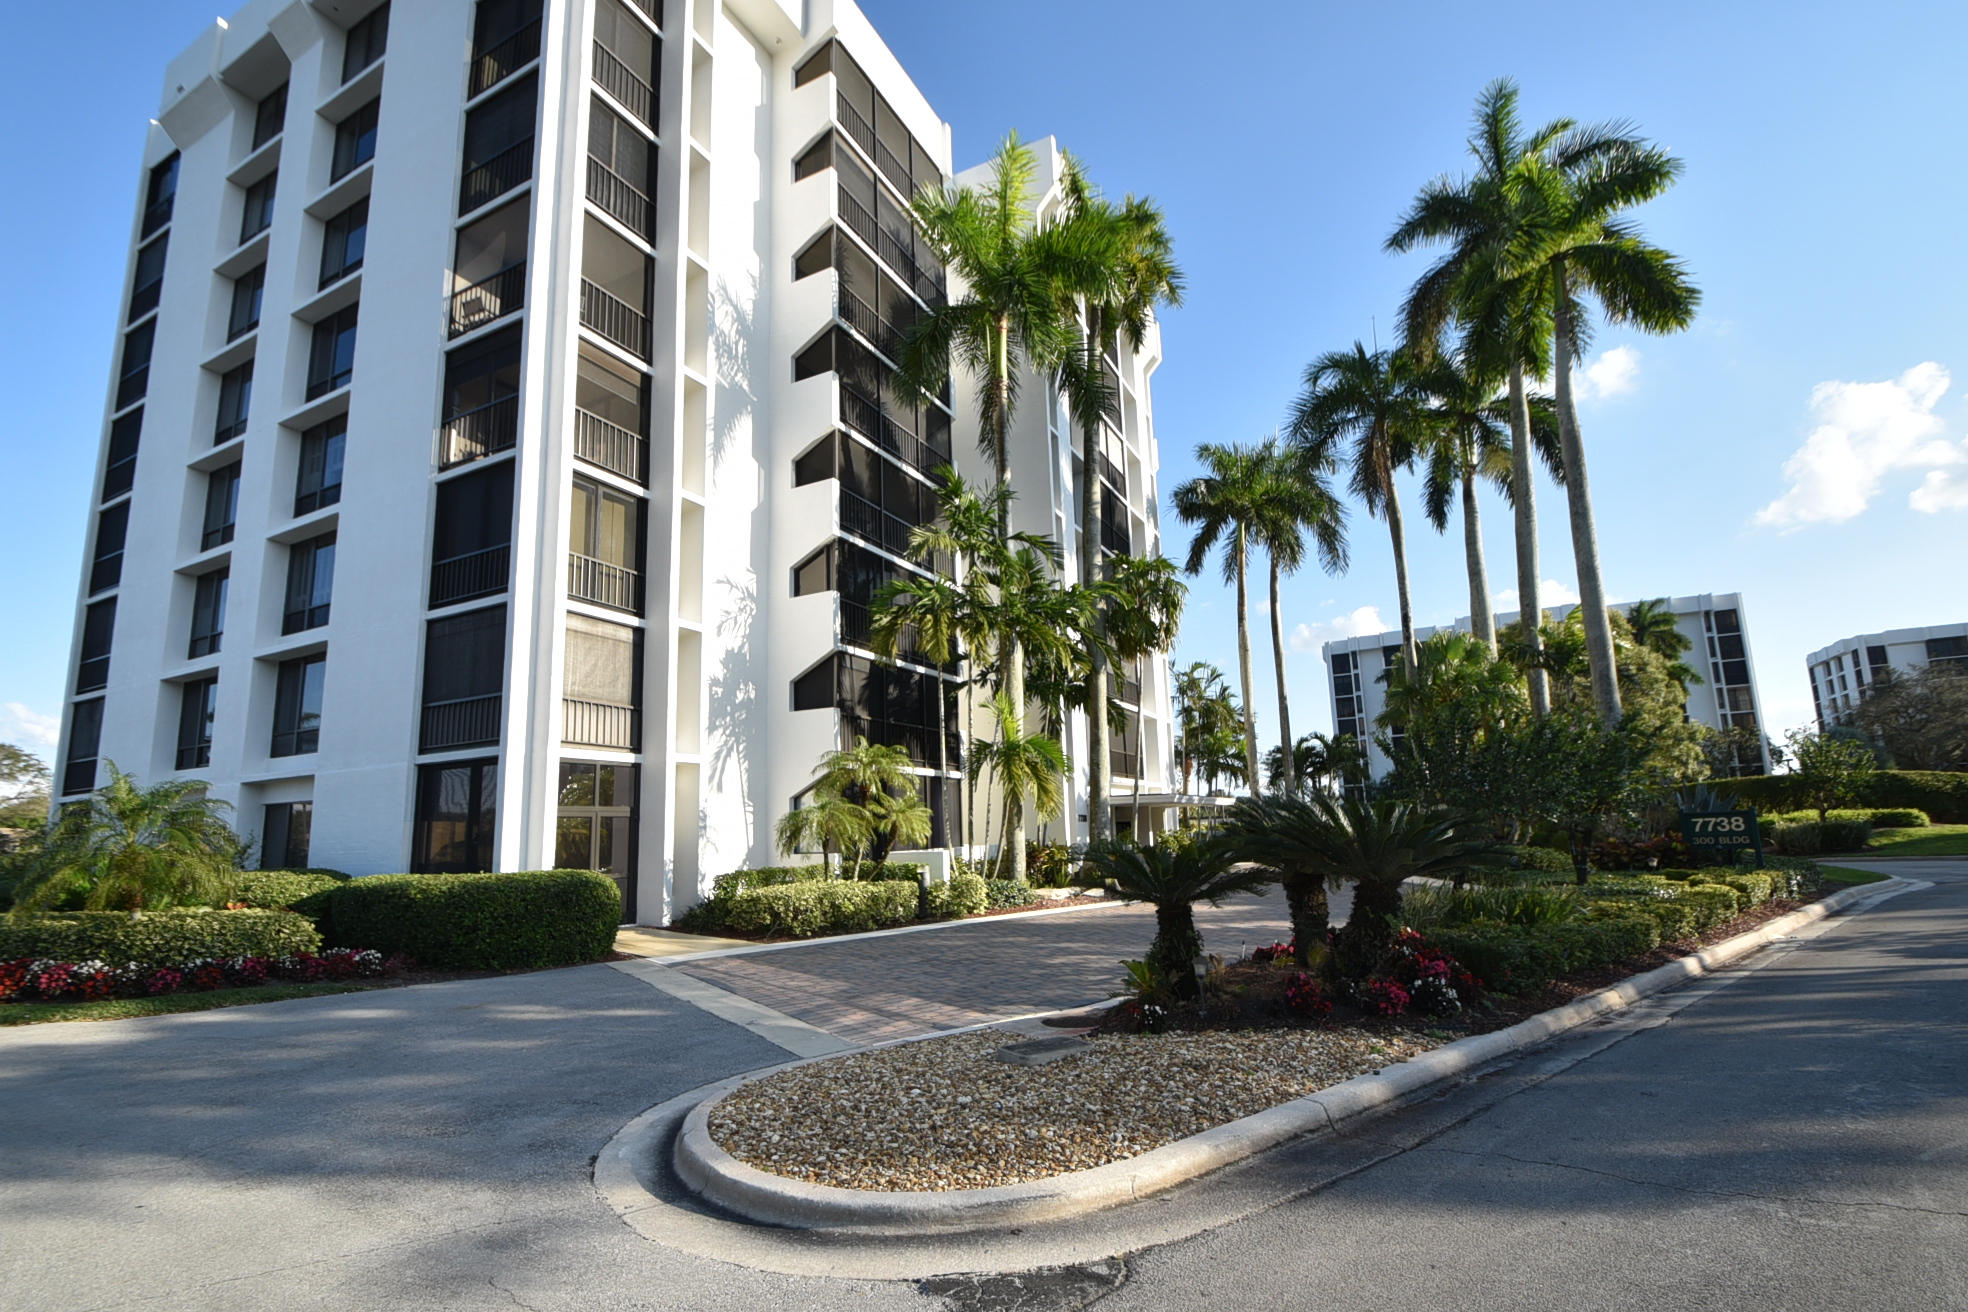 7754 Lakeside Boulevard #431 Boca Raton, FL 33434